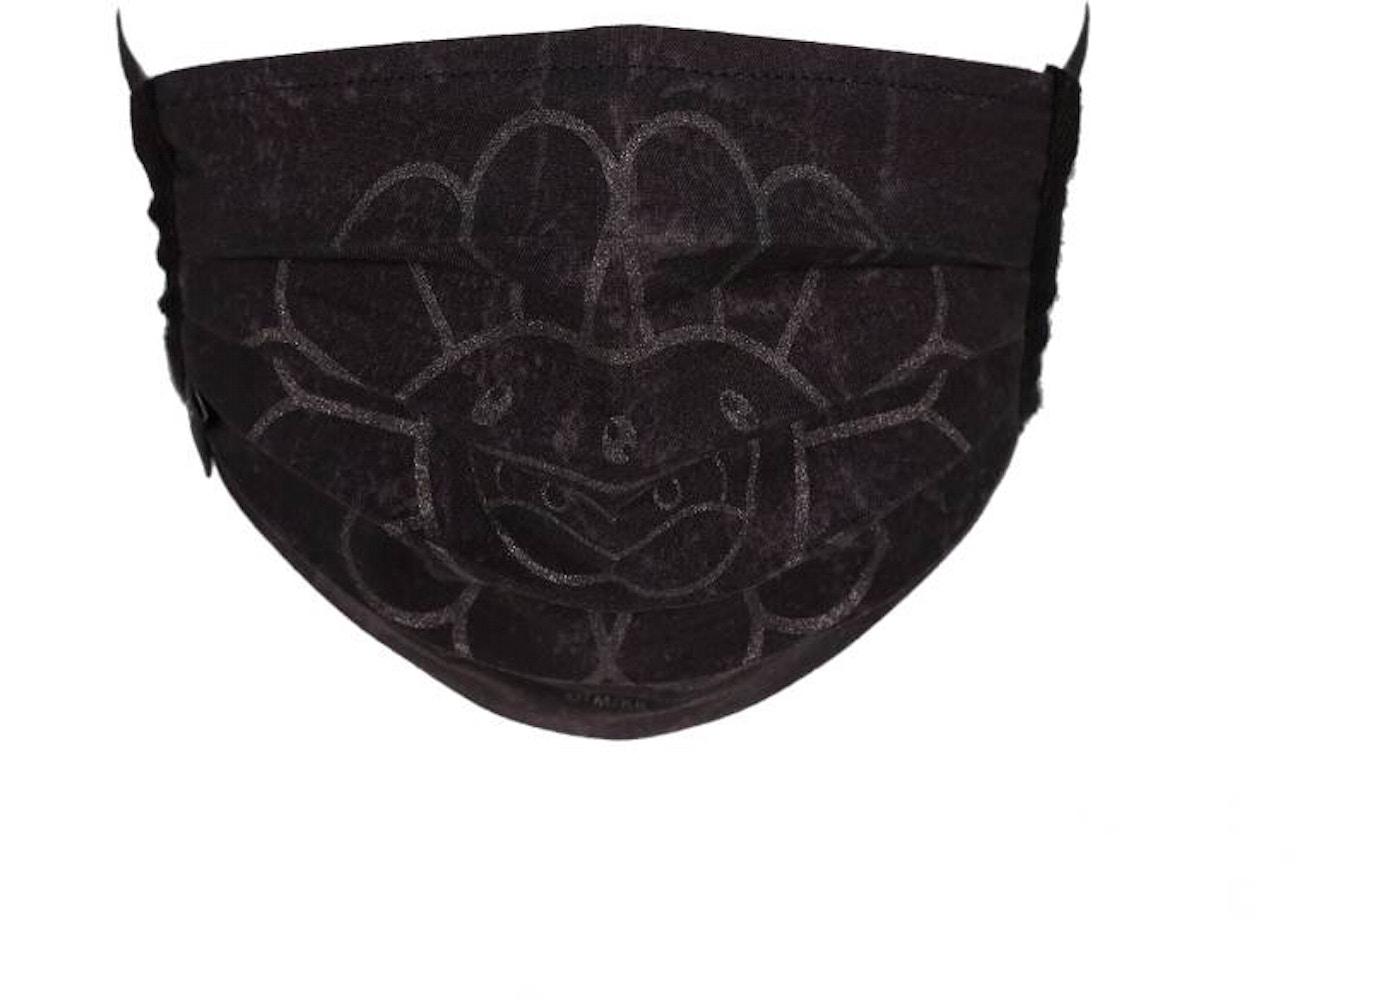 Takashi Murakami Doubleface Flower Face Mask Black Black Ss20